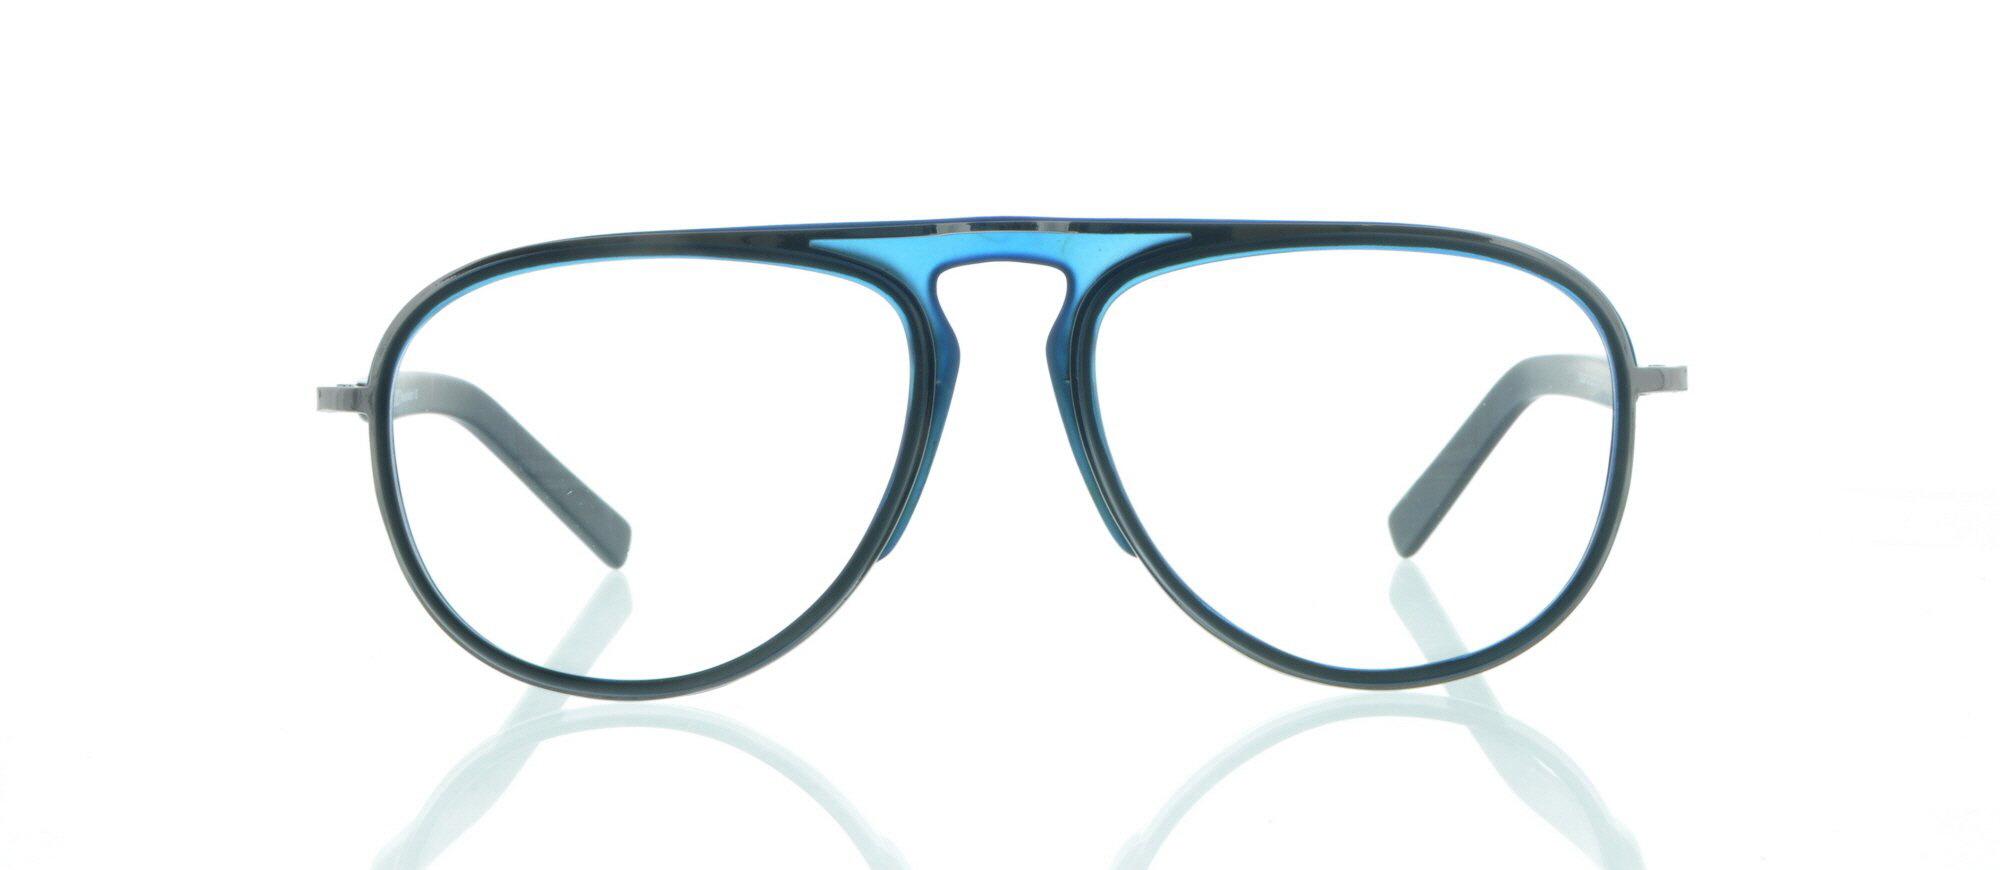 1A-sehen.de Brille 1A-sehen.de 1202 C2 silber/blau xeZ4j5UOD